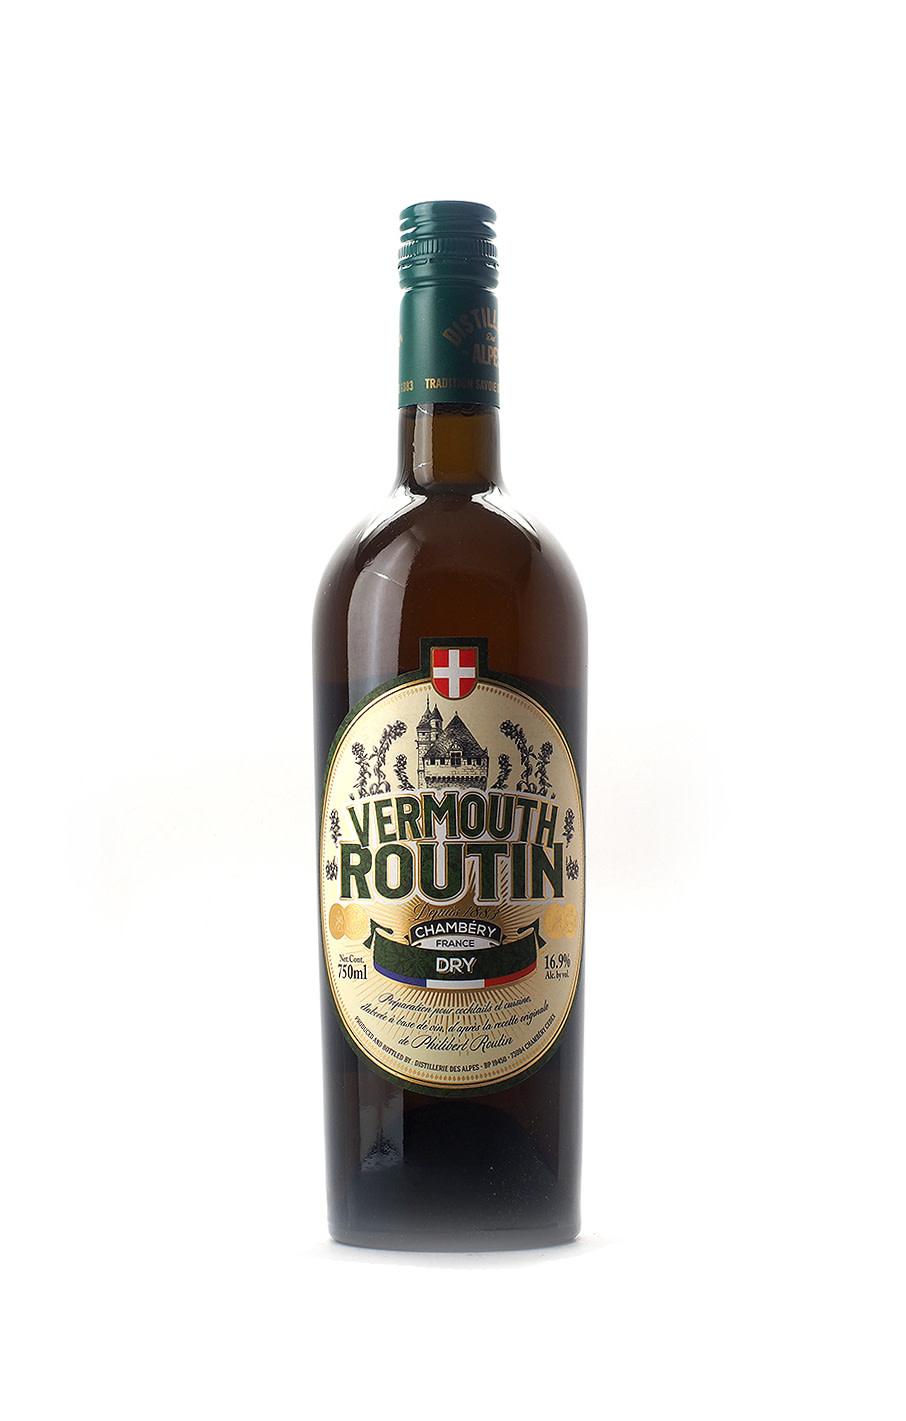 Routin Vermouth Dry NV